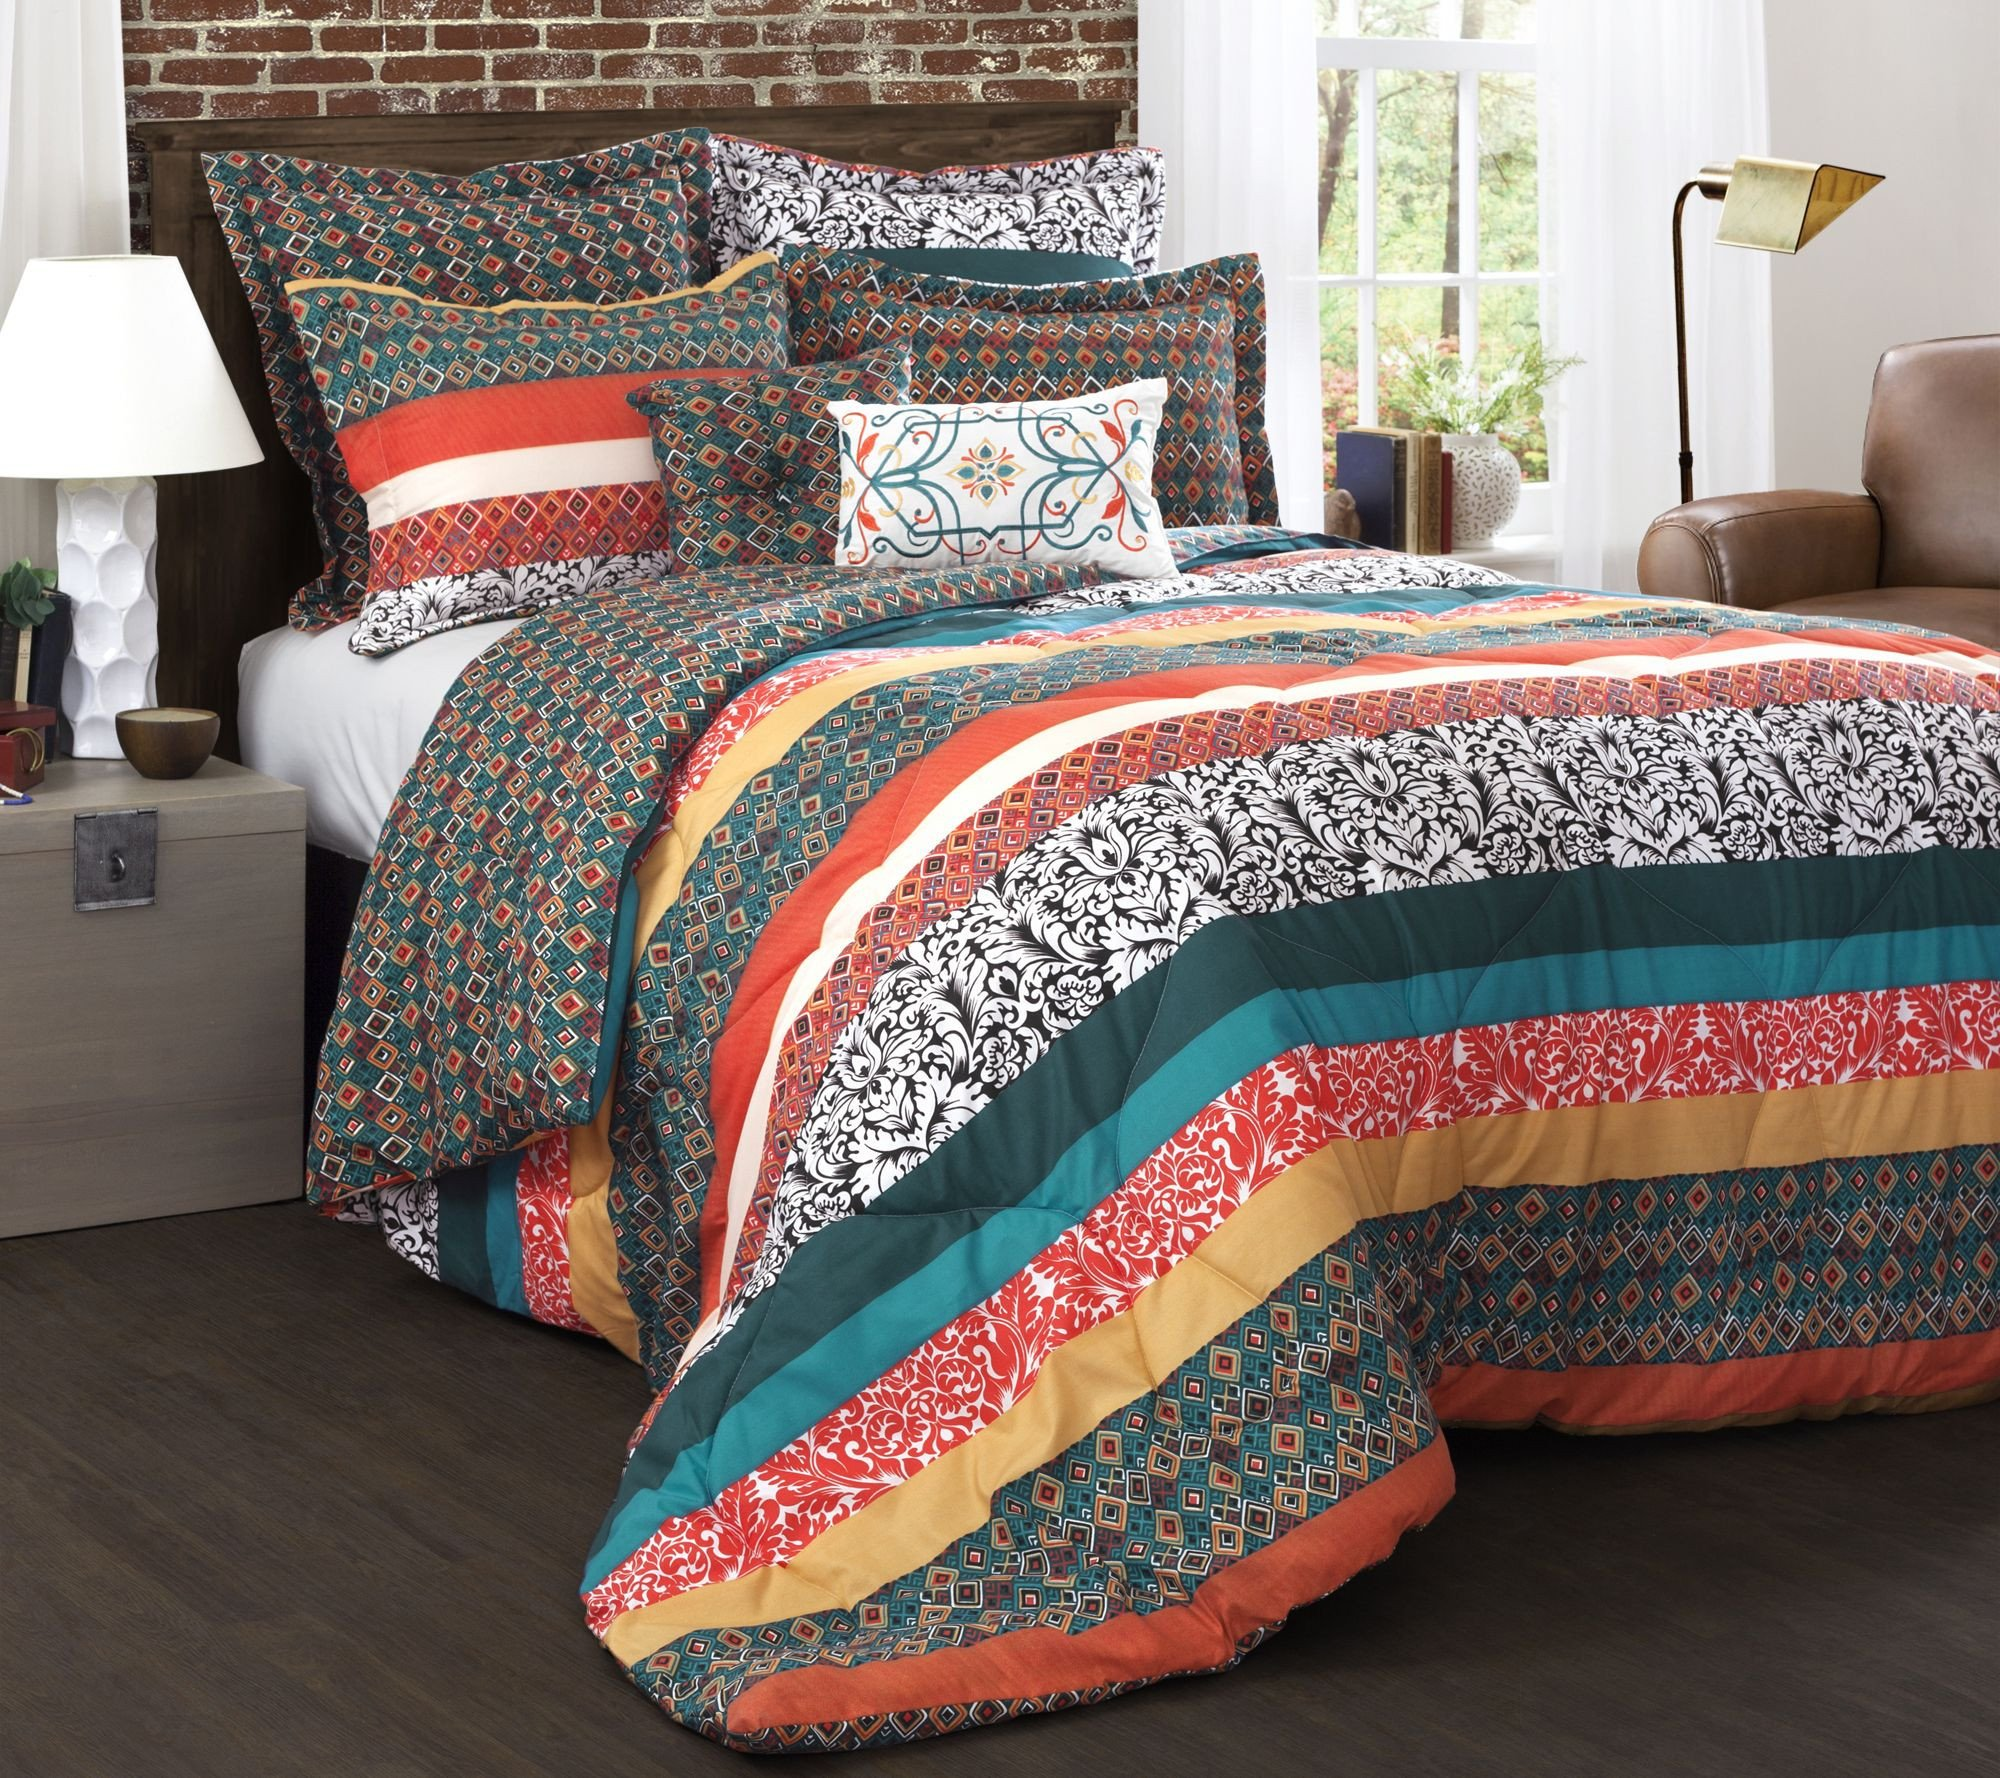 King Size Bedroom Comforter Set Inspirational Boho Stripe 7 Piece King forter Set by Lush Decor — Qvc